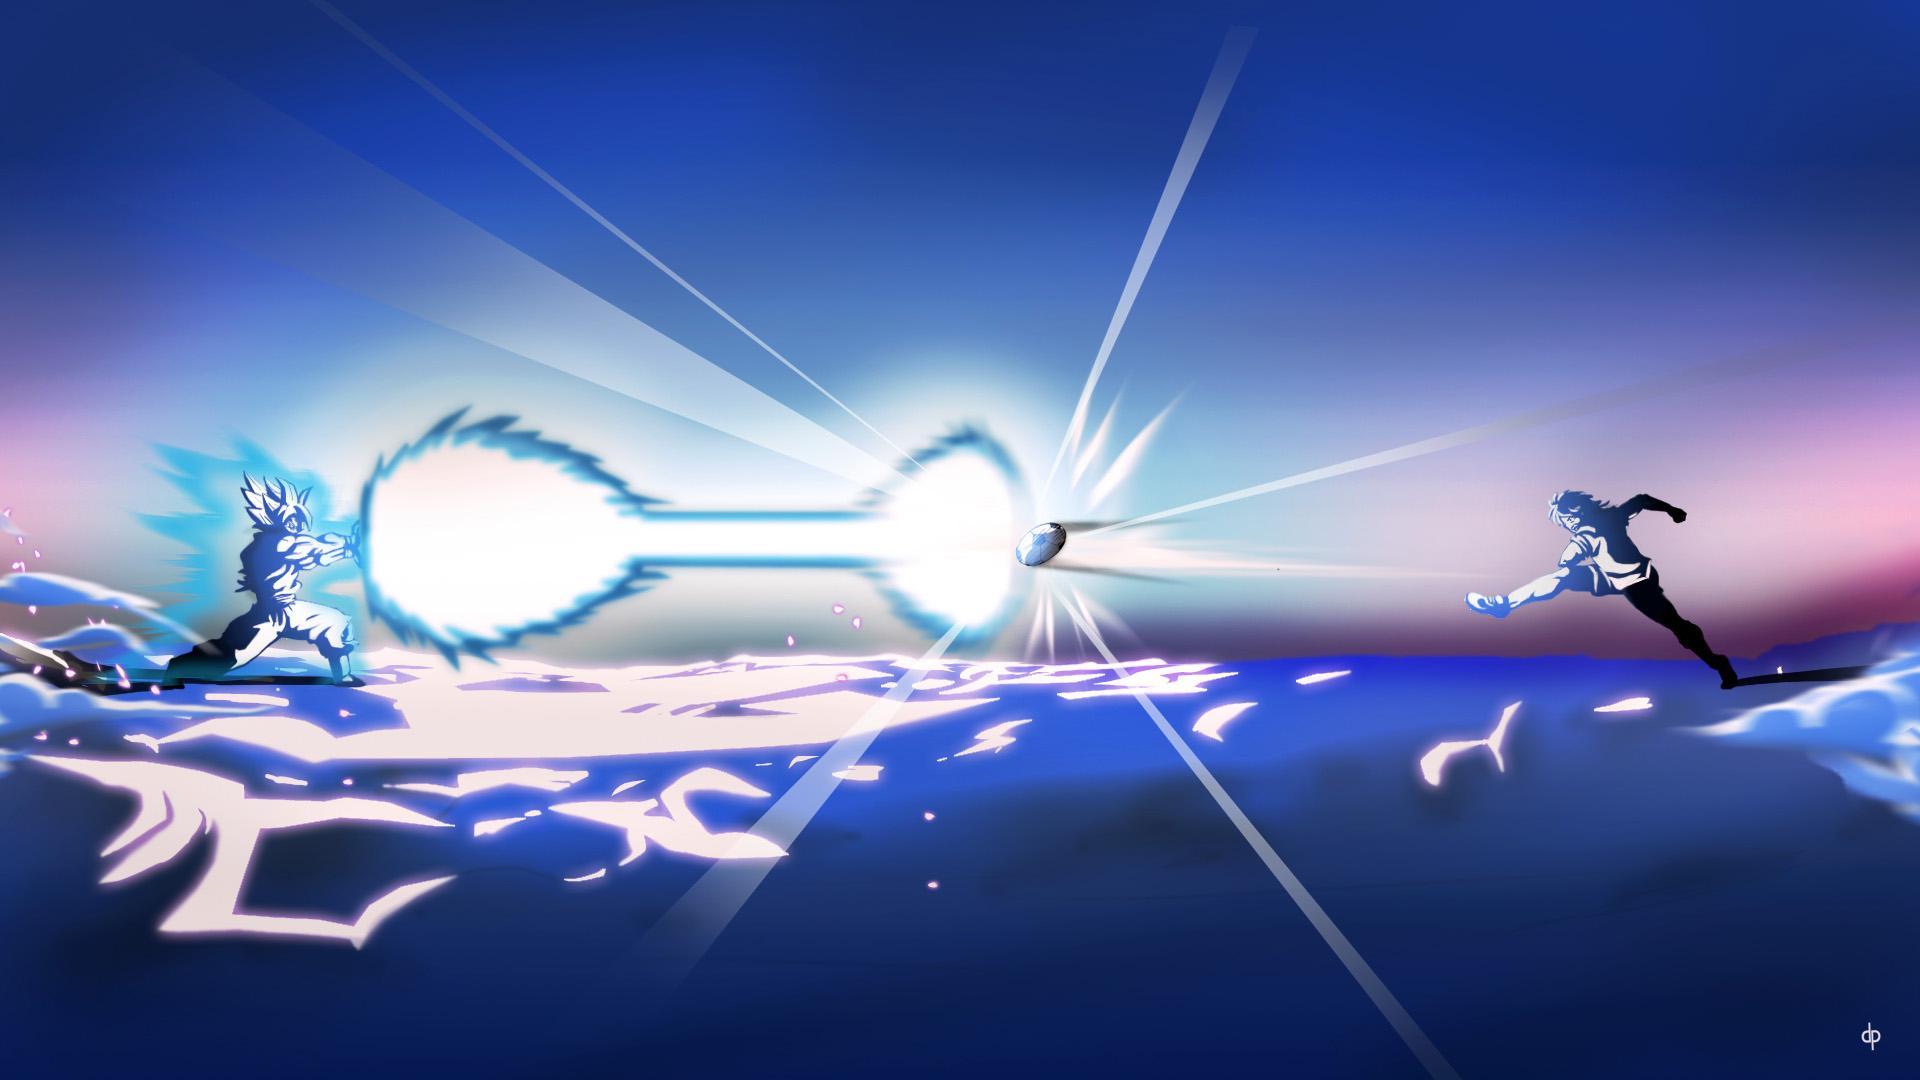 Goku vs Superman Goku_vs_mark_lenders_by_dimitroncio-d60kn8q